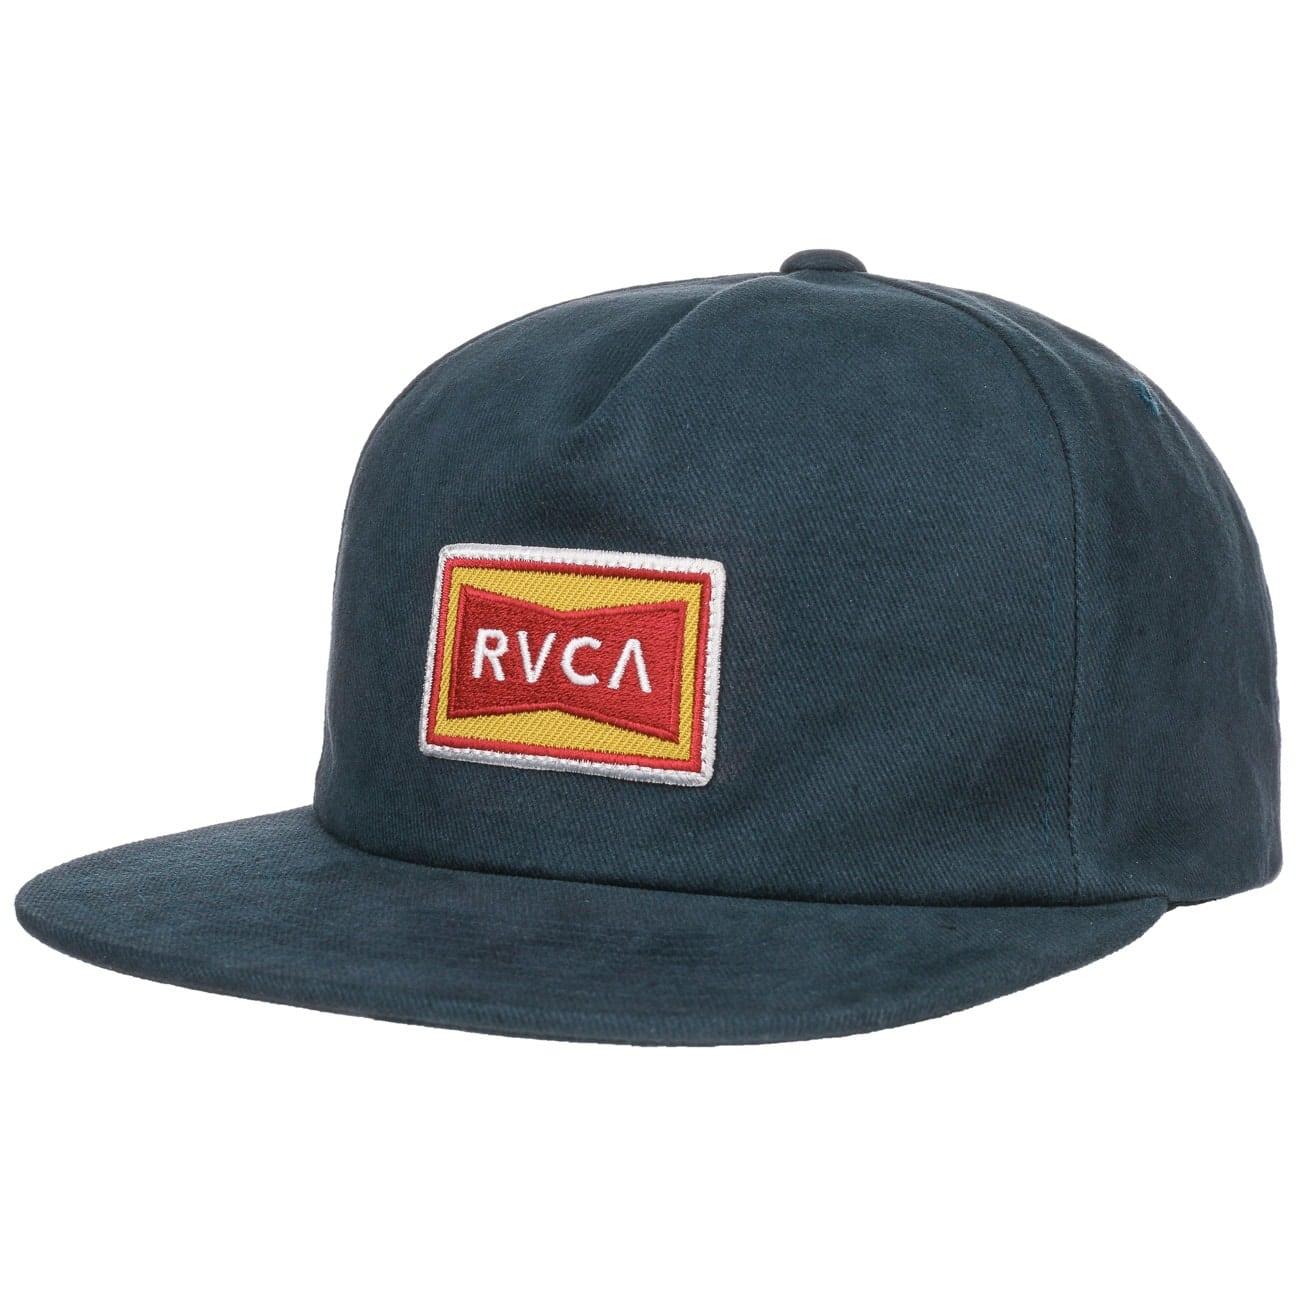 Casquette Snapback Cotton by RVCA  casquette visière plate